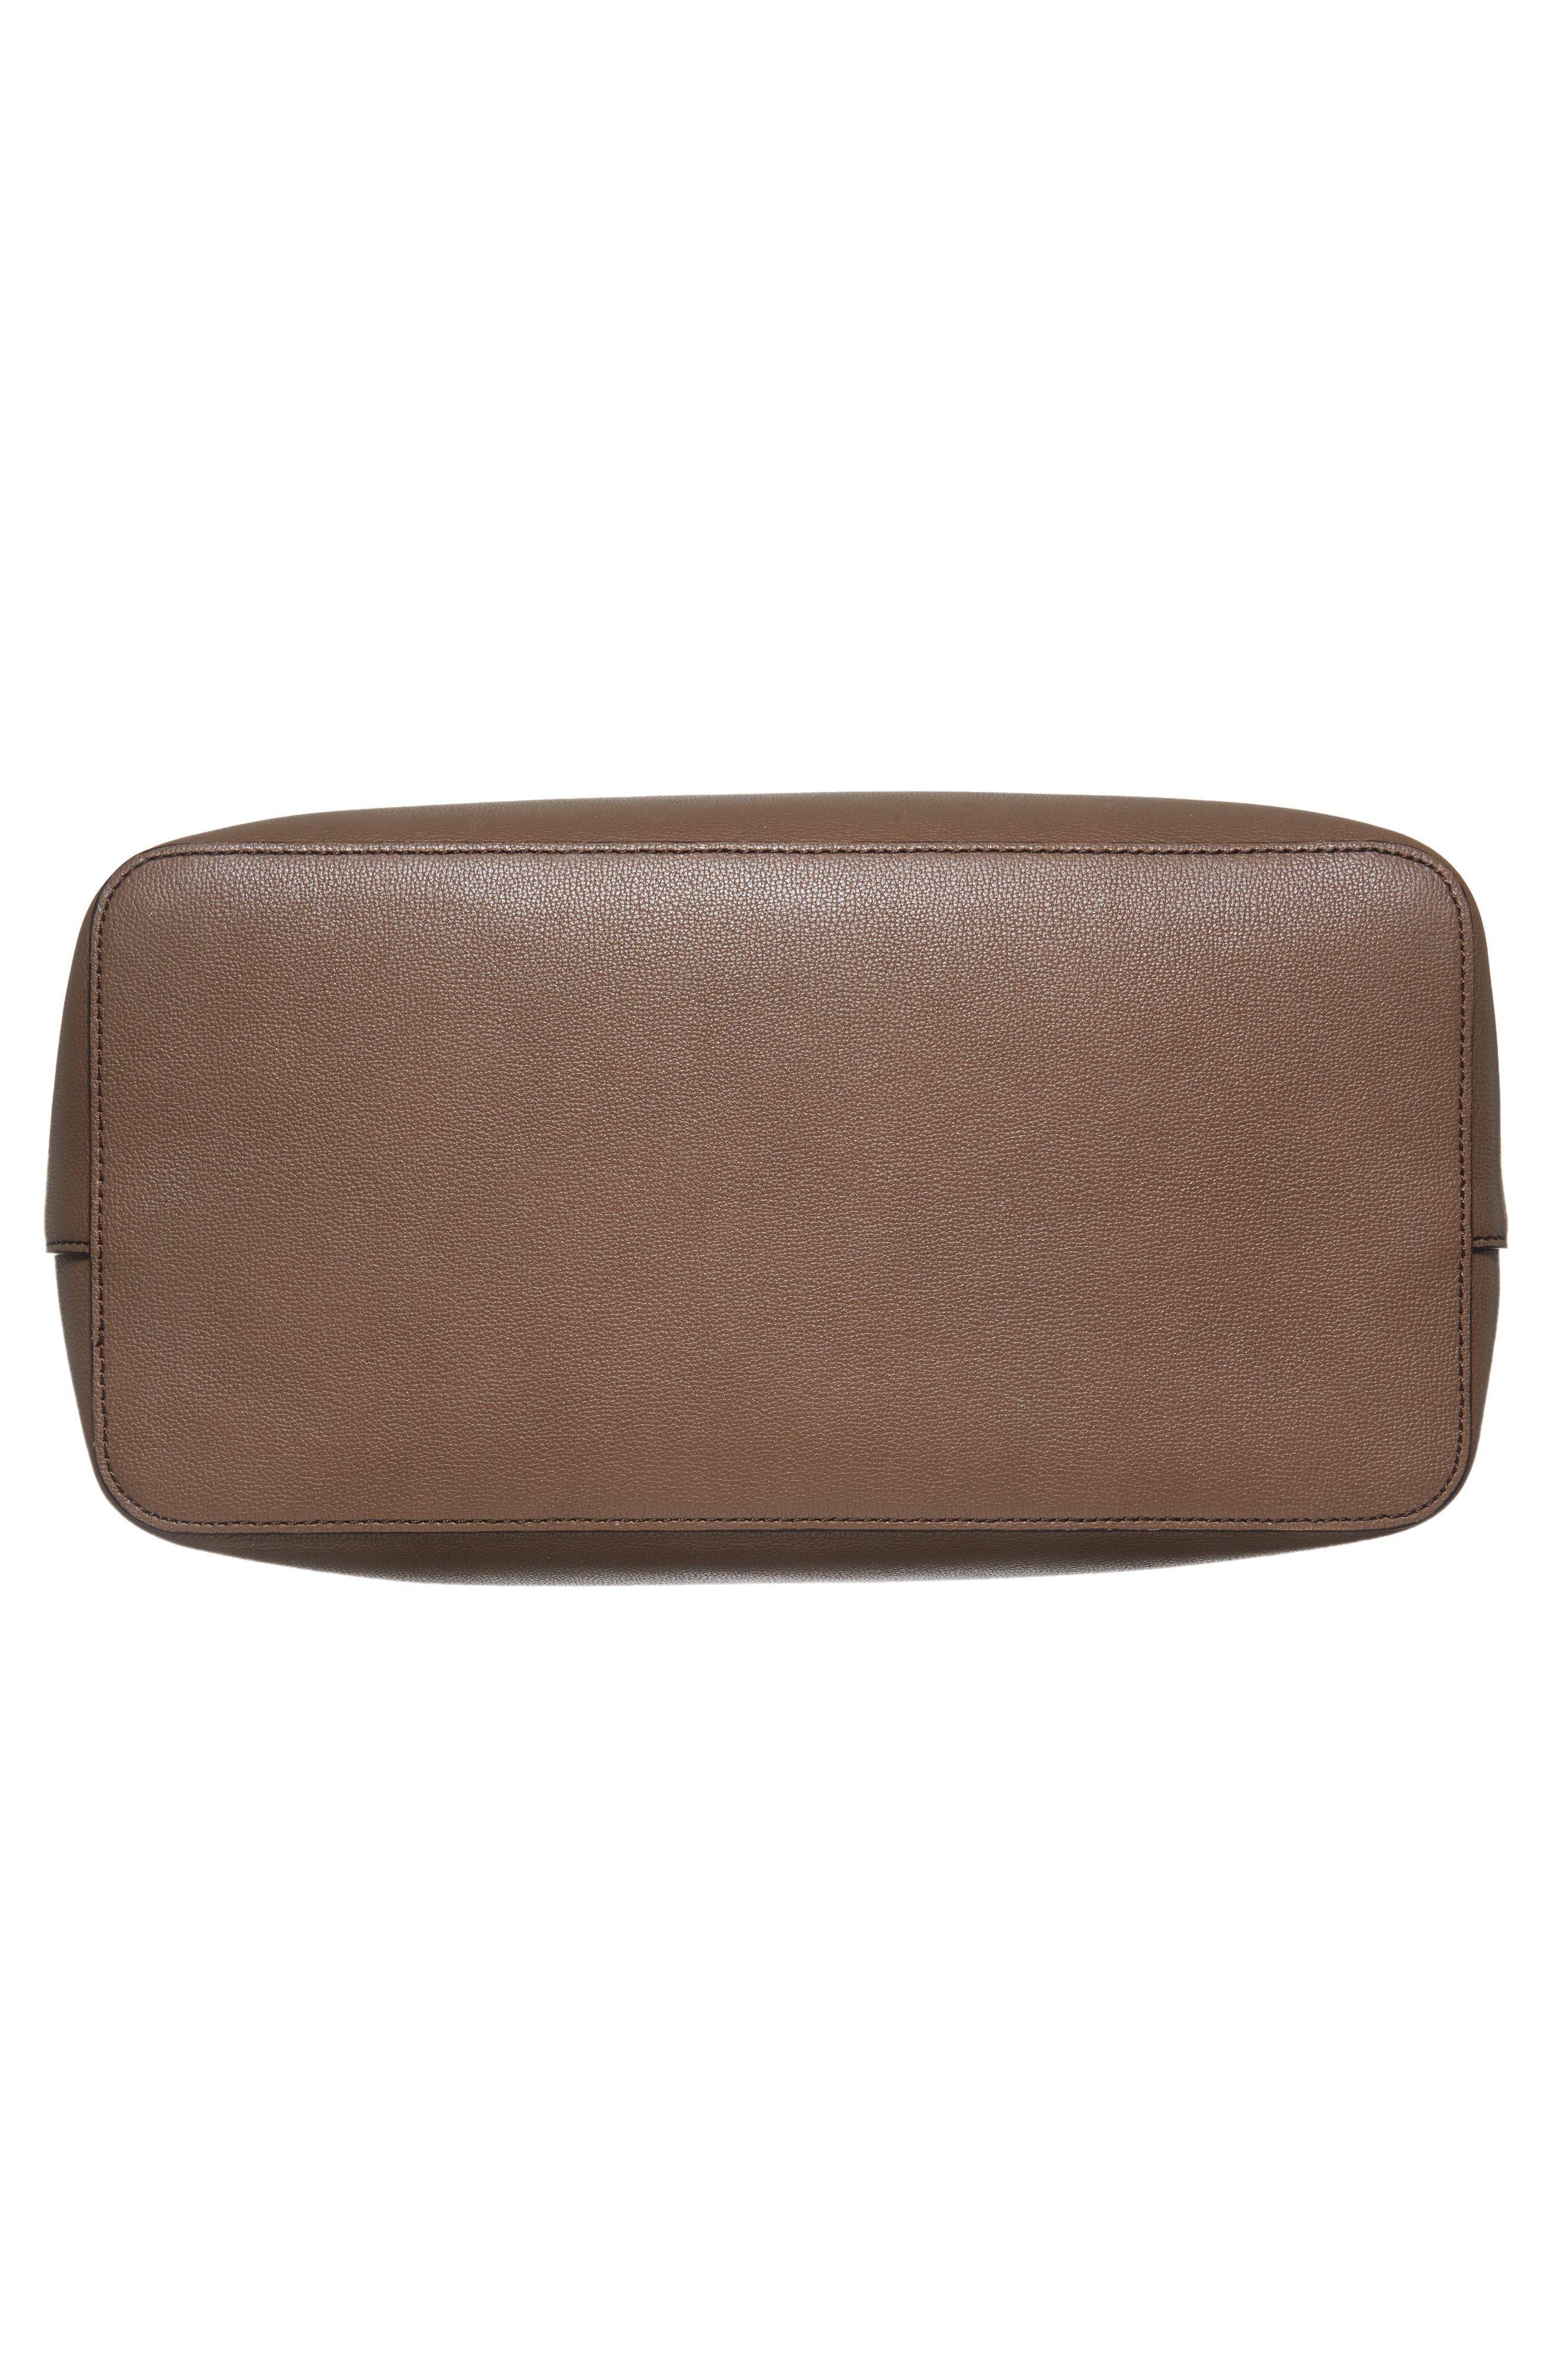 Alternate Image 5  - Max Mara Pebbled Leather Shopper